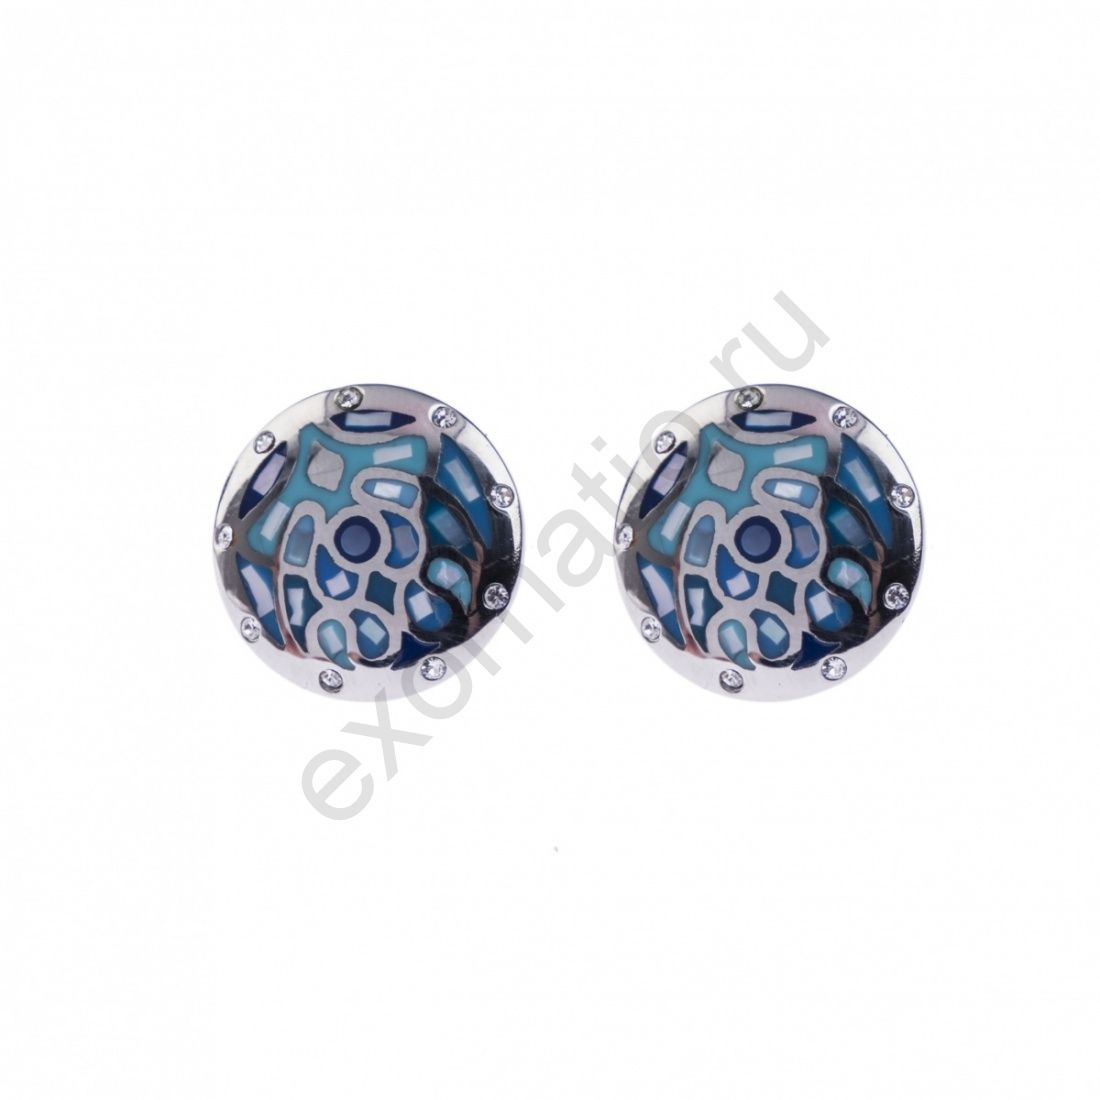 Серьги Fiore Luna AE01219-10 BL